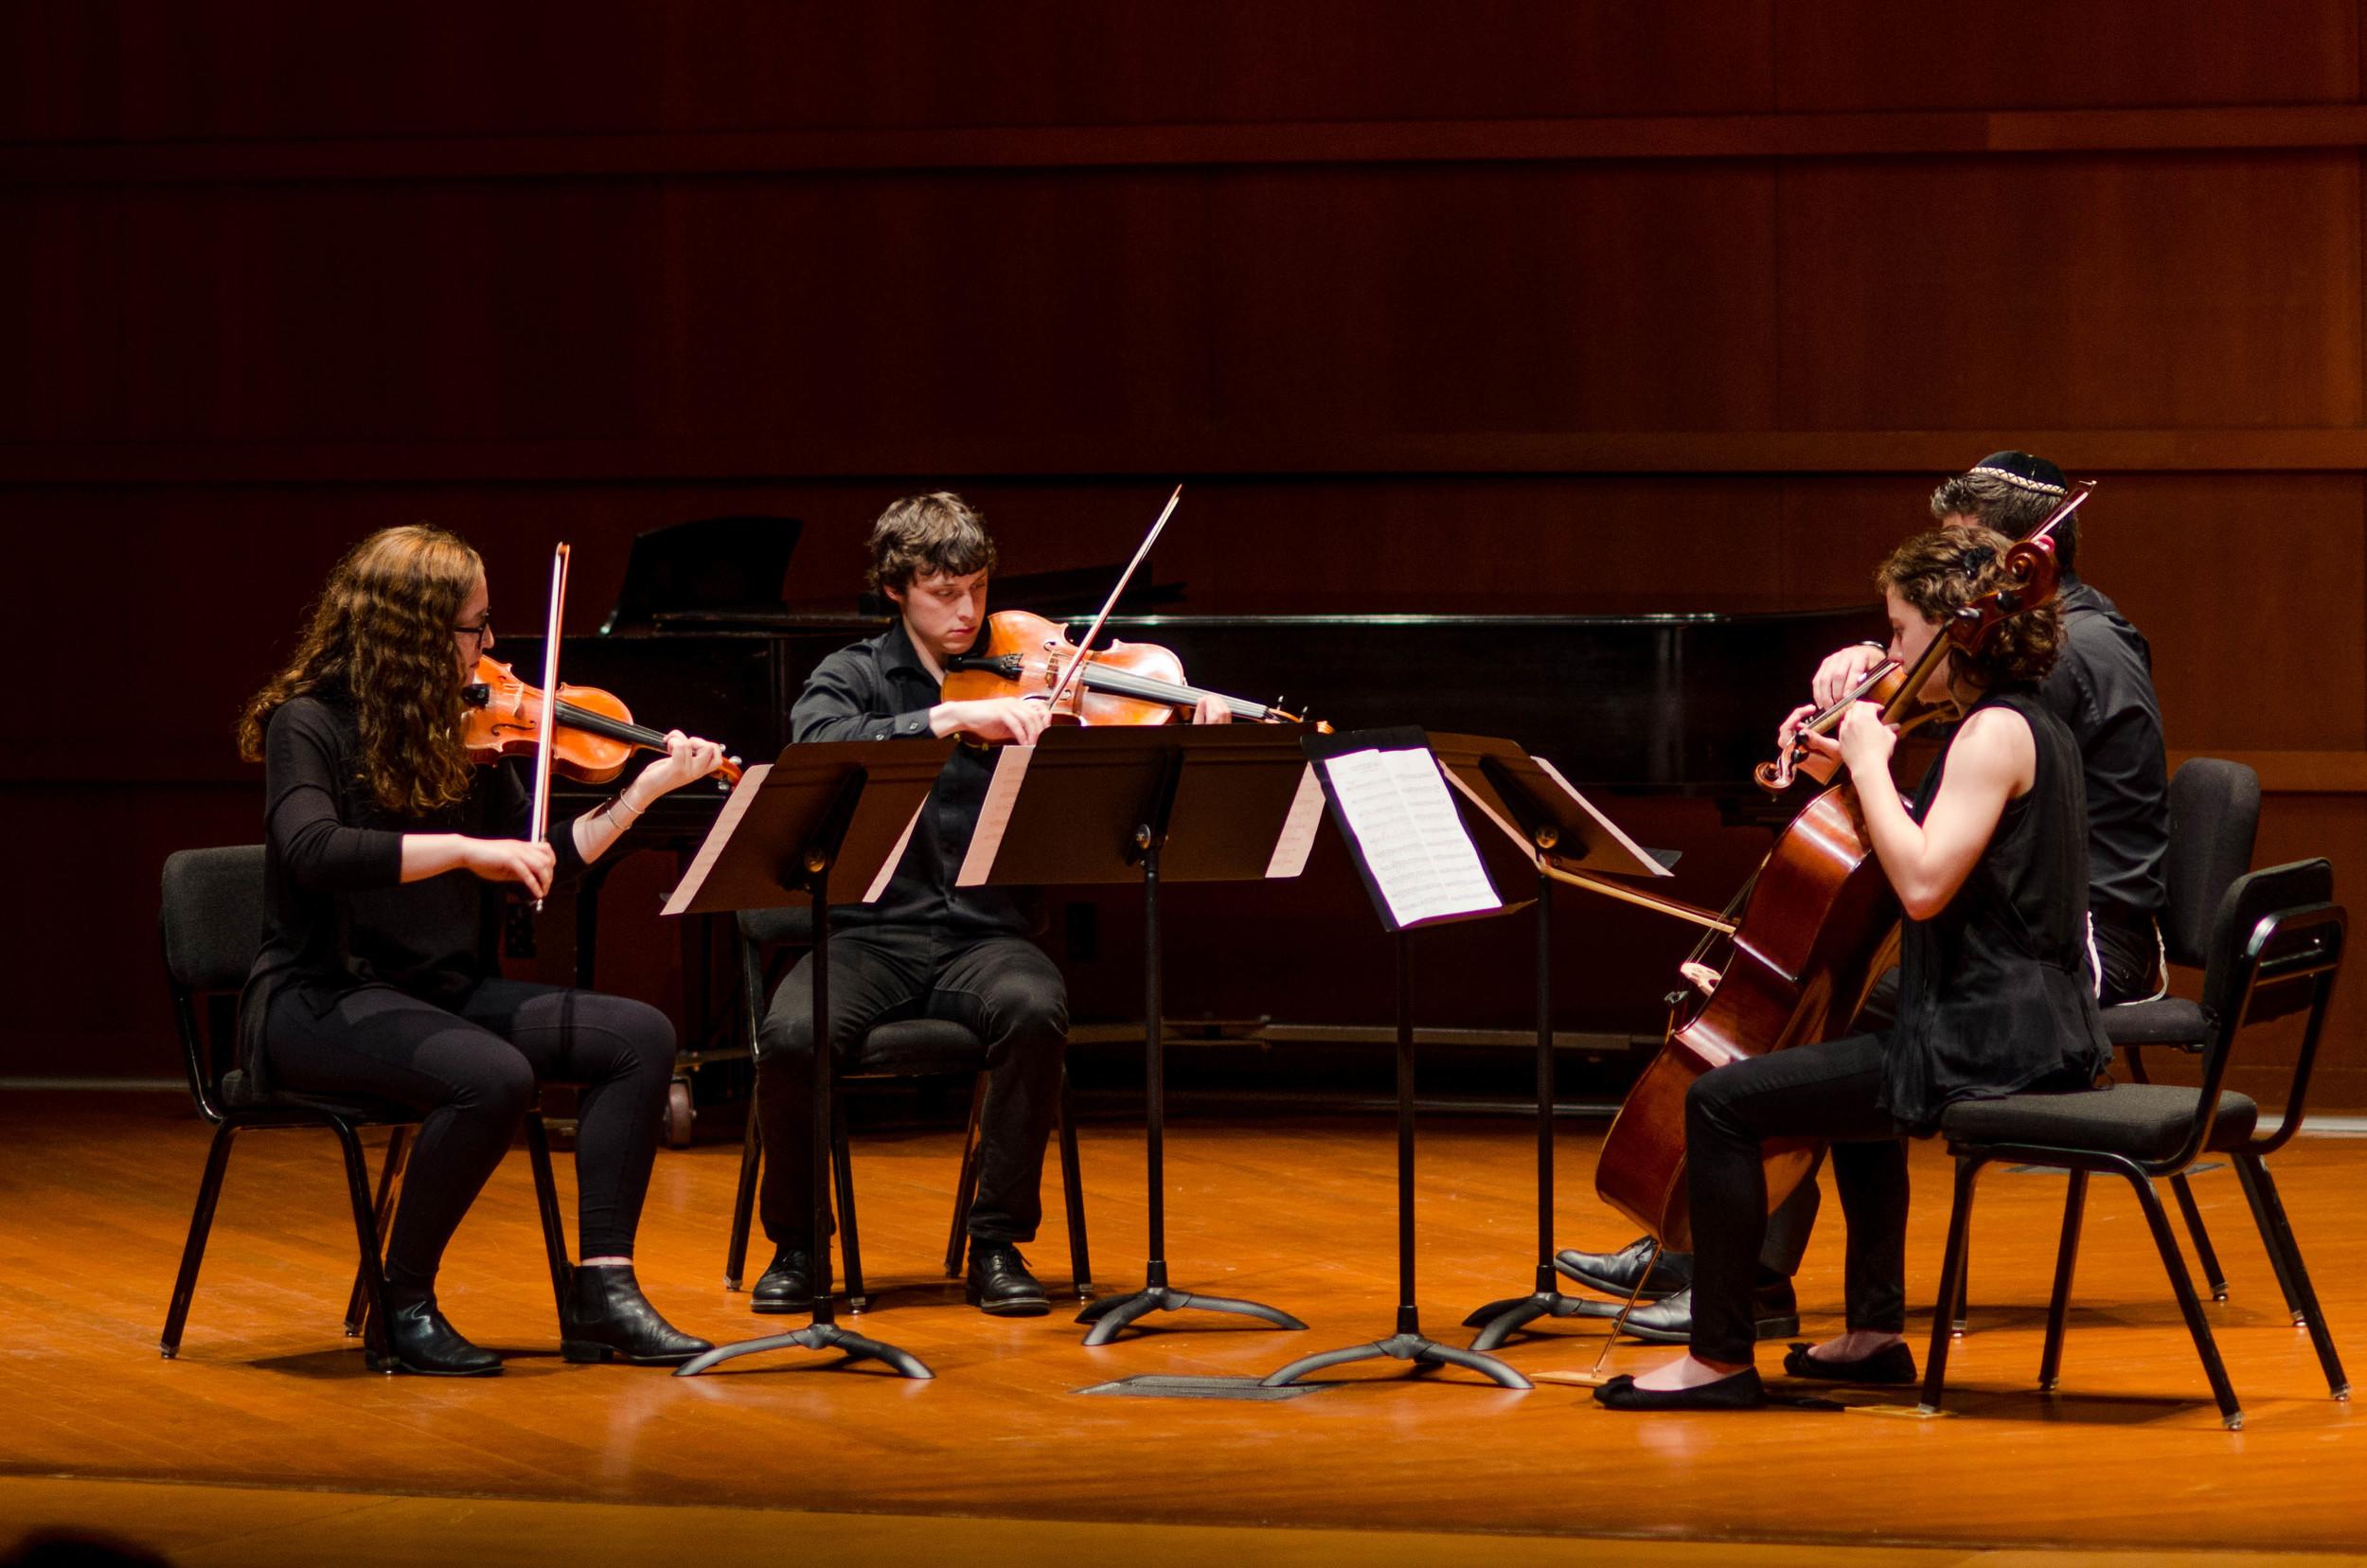 String quartet featuring Emily Hines, Jacob Ziontz, David Kraemer and Julia Marquez.